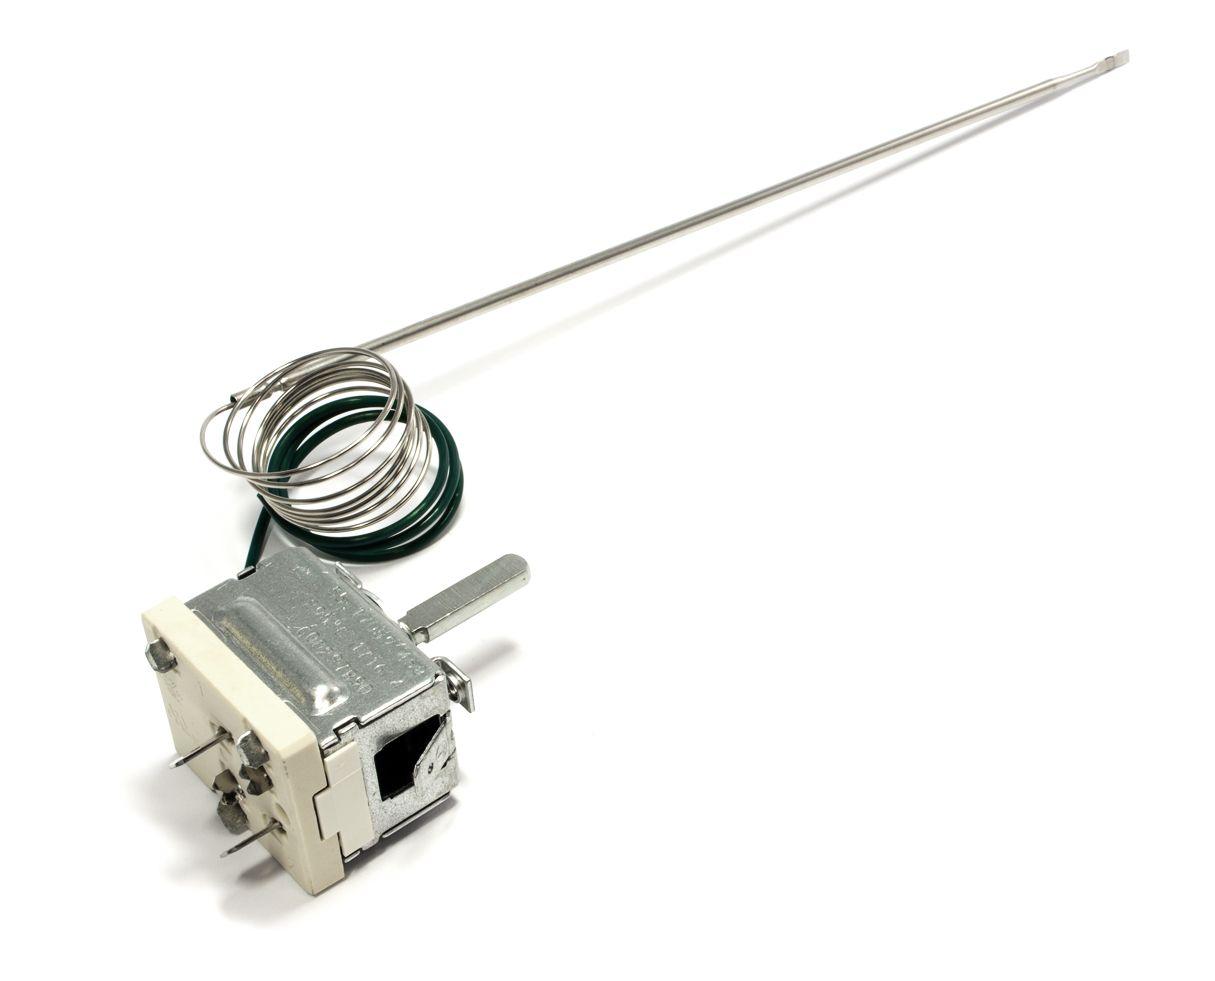 termostat do trouby Indesit, Ariston - C00525823 Whirlpool / Indesit